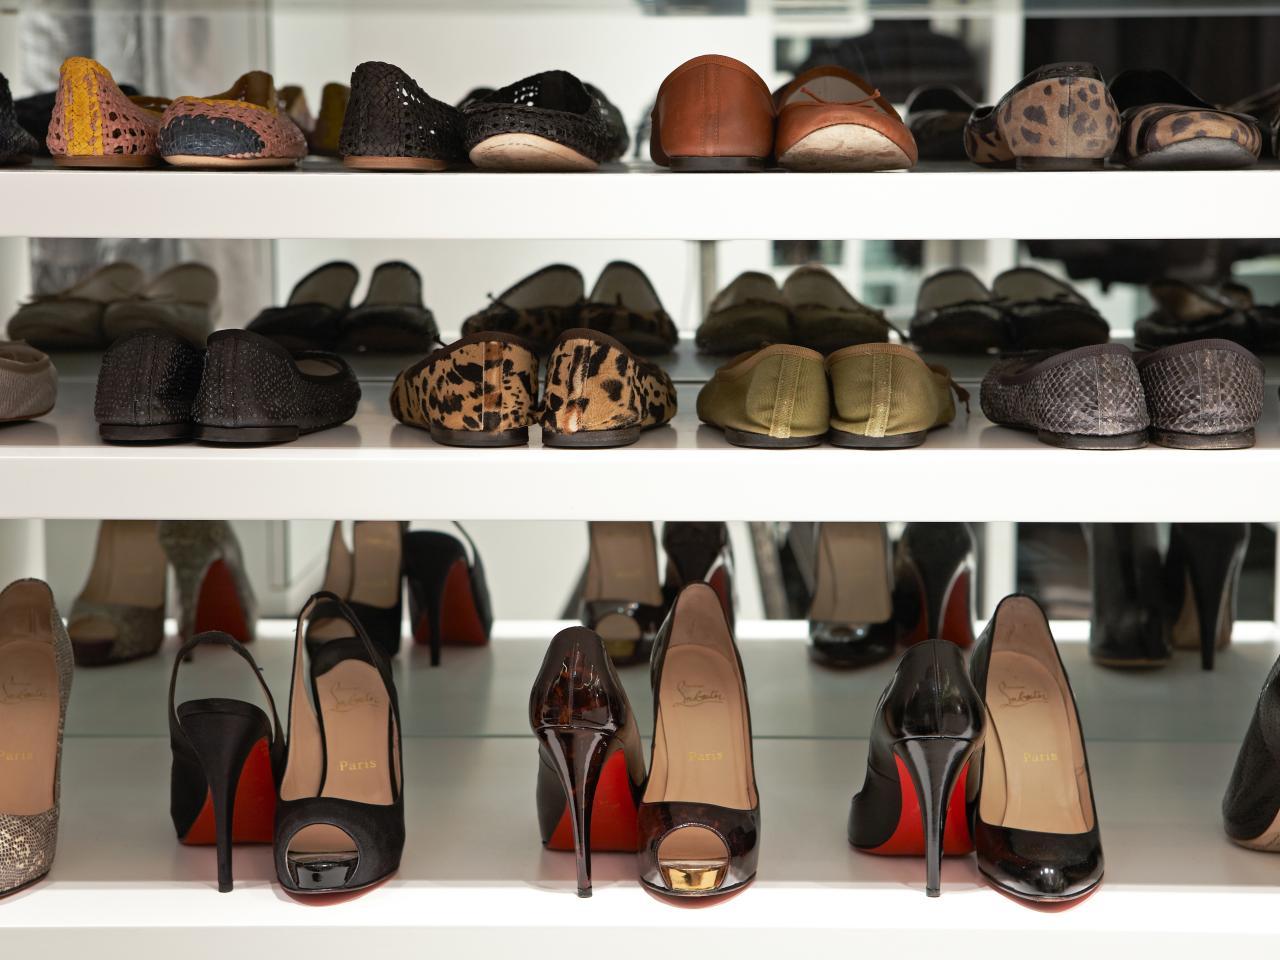 Mens Shoe Closet over-the-door shoe racks and organizers | hgtv